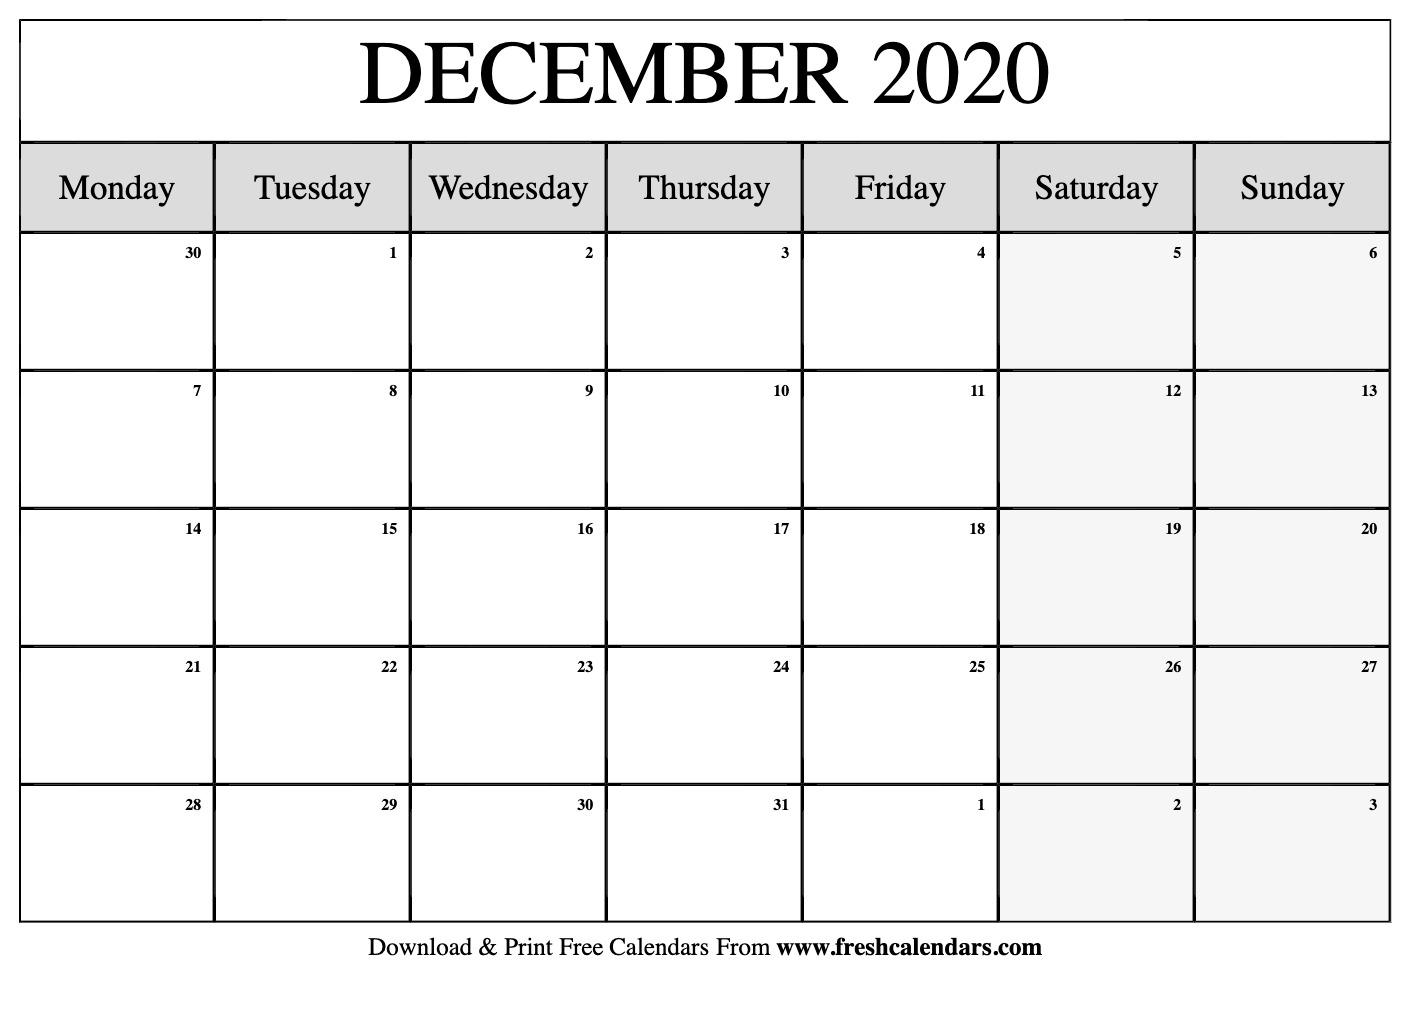 Free Printable December 2020 Calendar intended for Monday Start Printable Calendar 2020